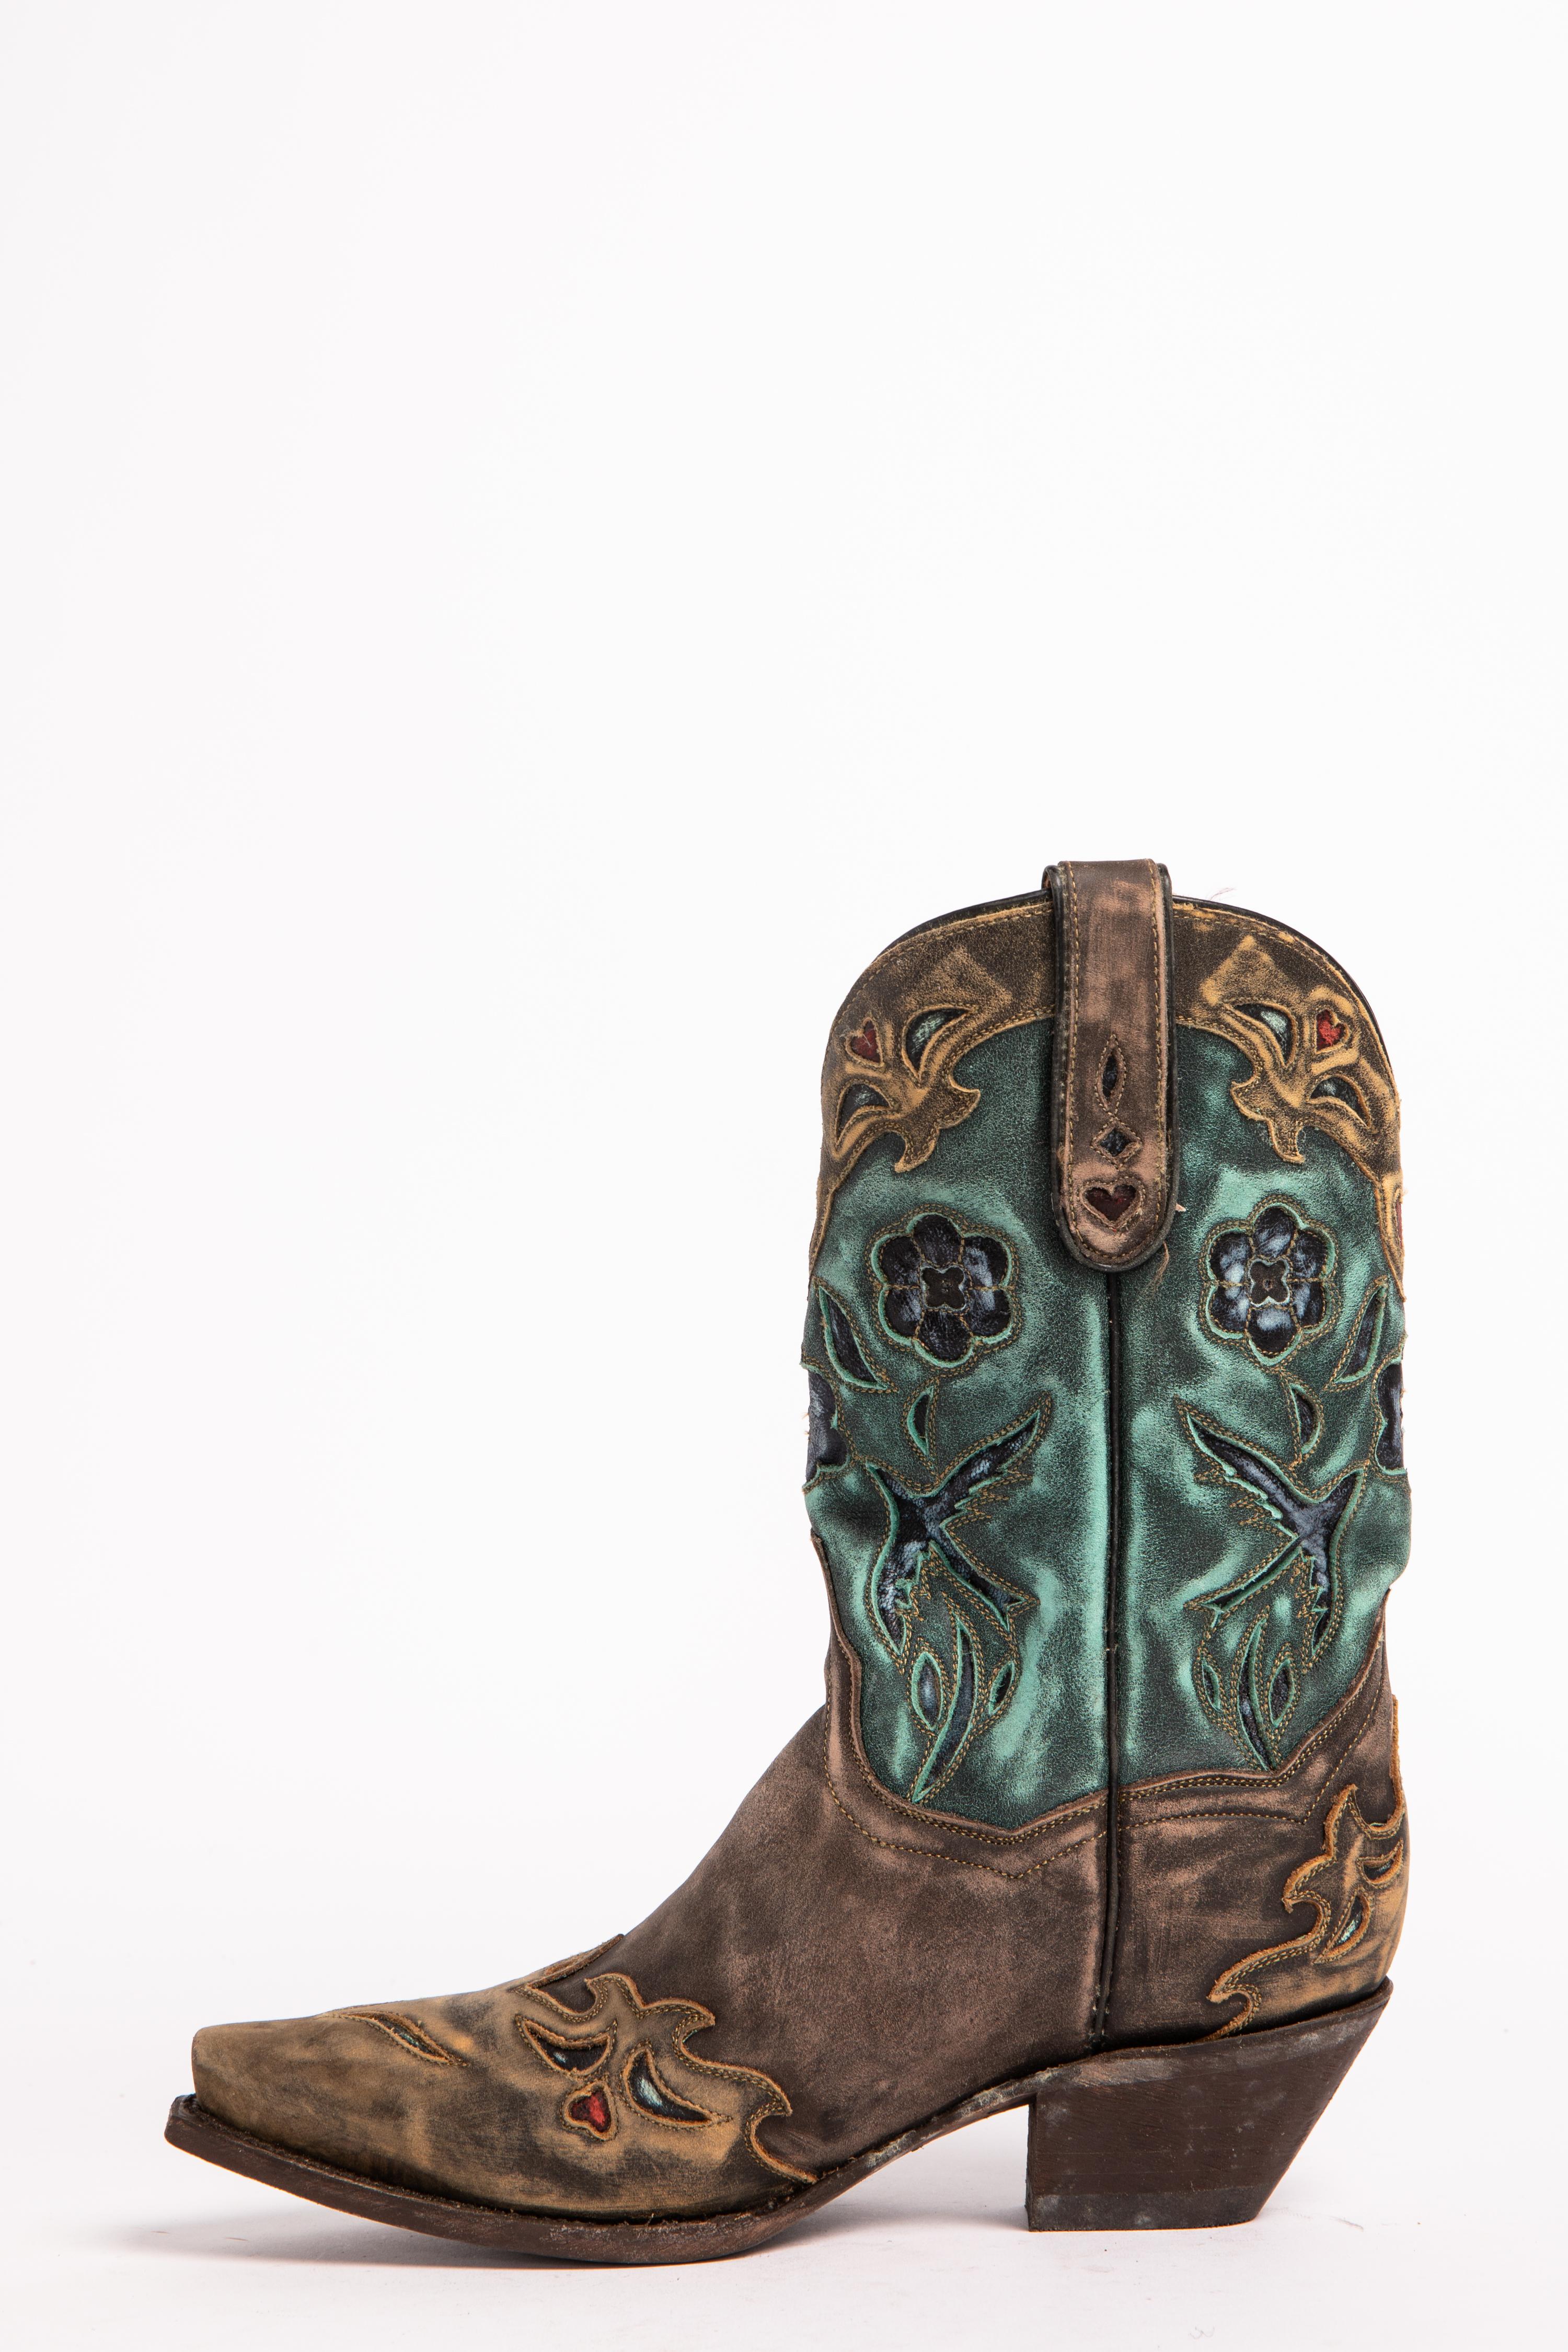 Dan Post Blue Bird Wingtip Cowgirl Boots - Snip Toe | Sheplers